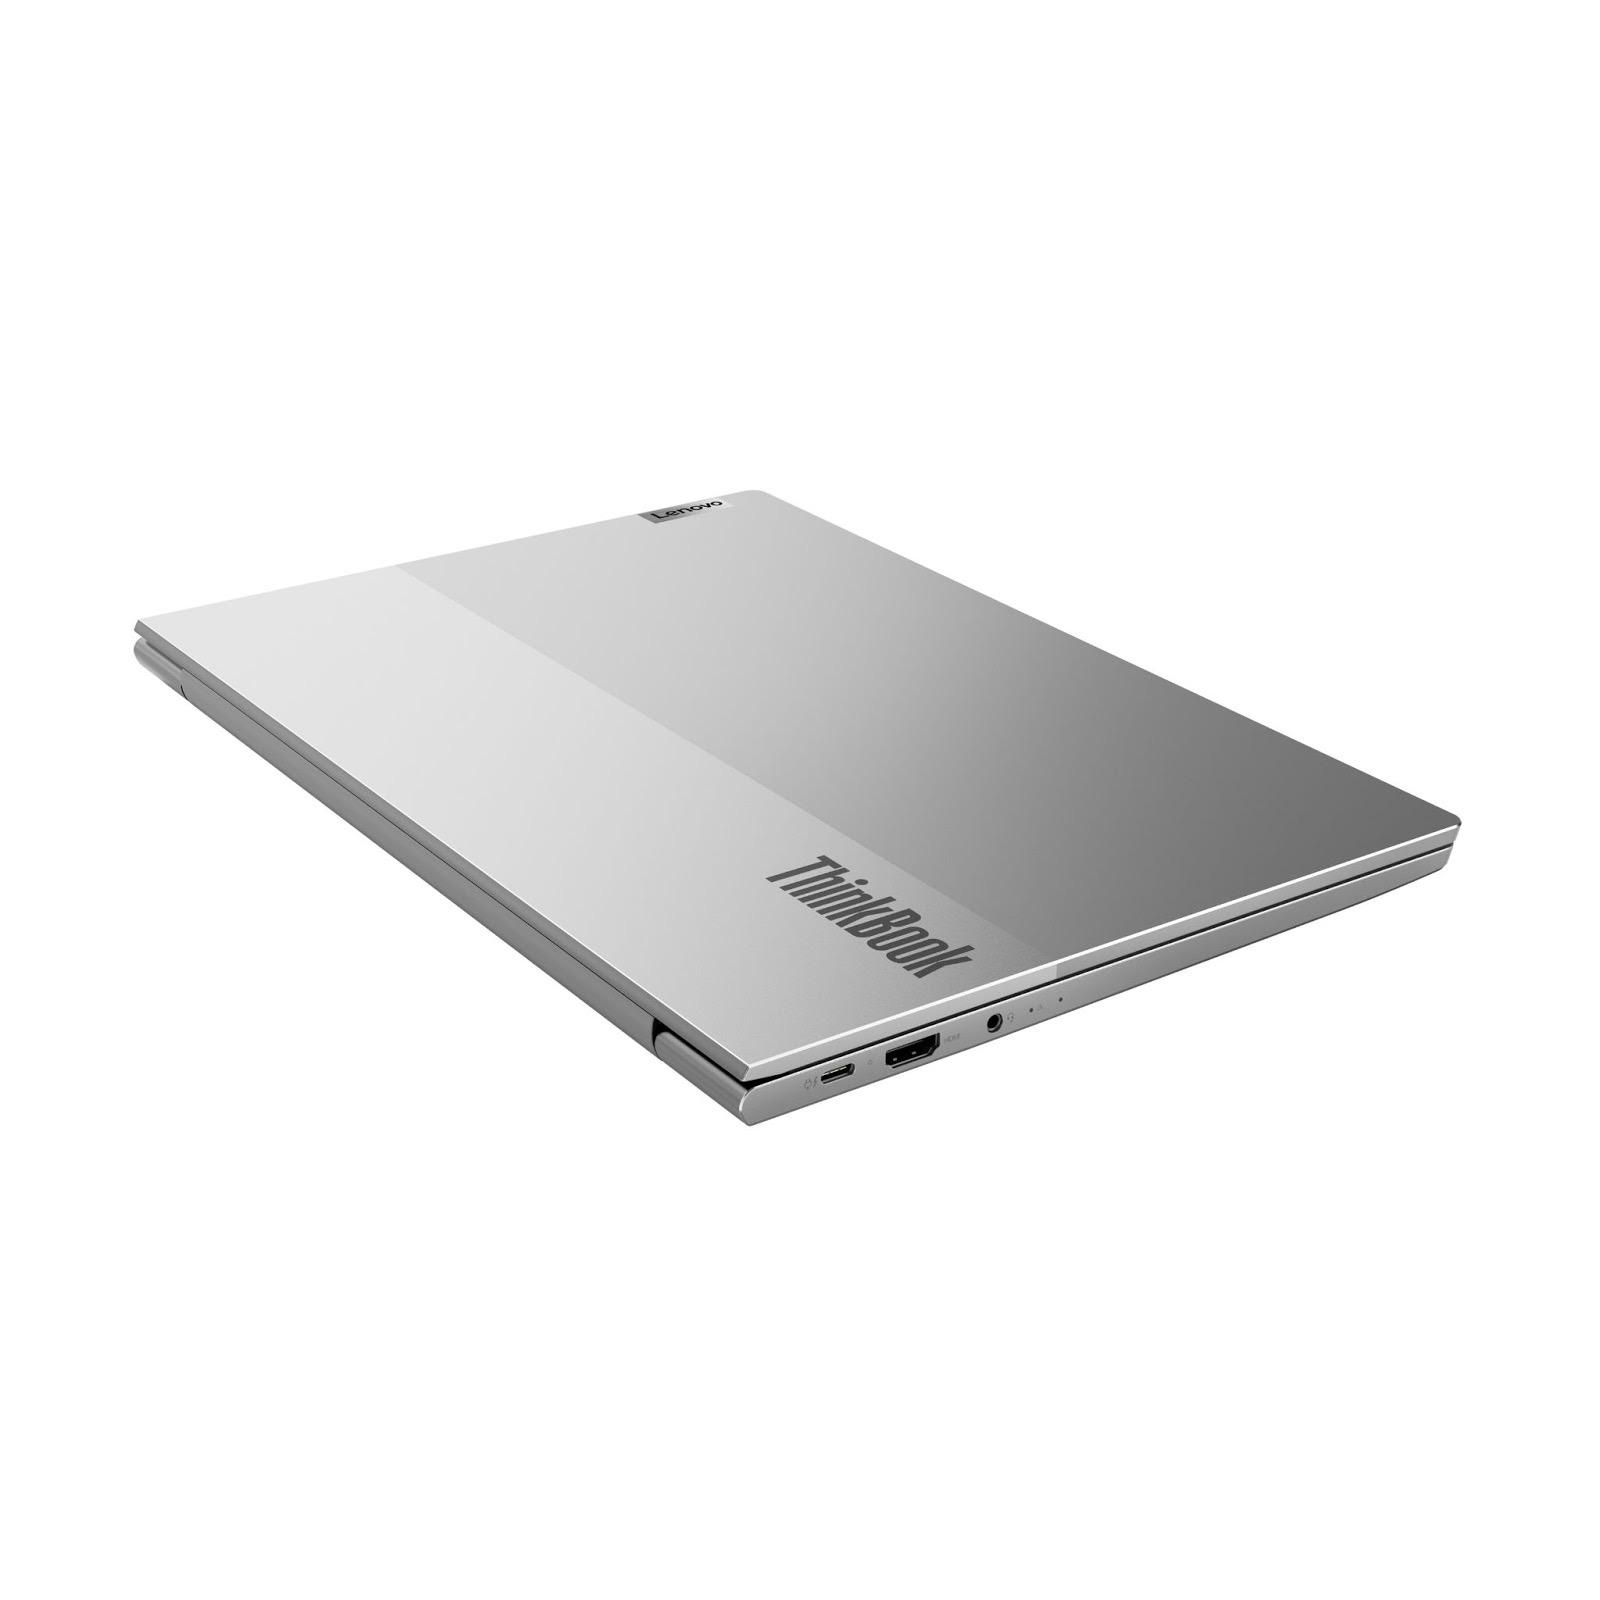 Фото 4. Ноутбук Lenovo ThinkBook 13s G2 ITL (20V9003ERU)